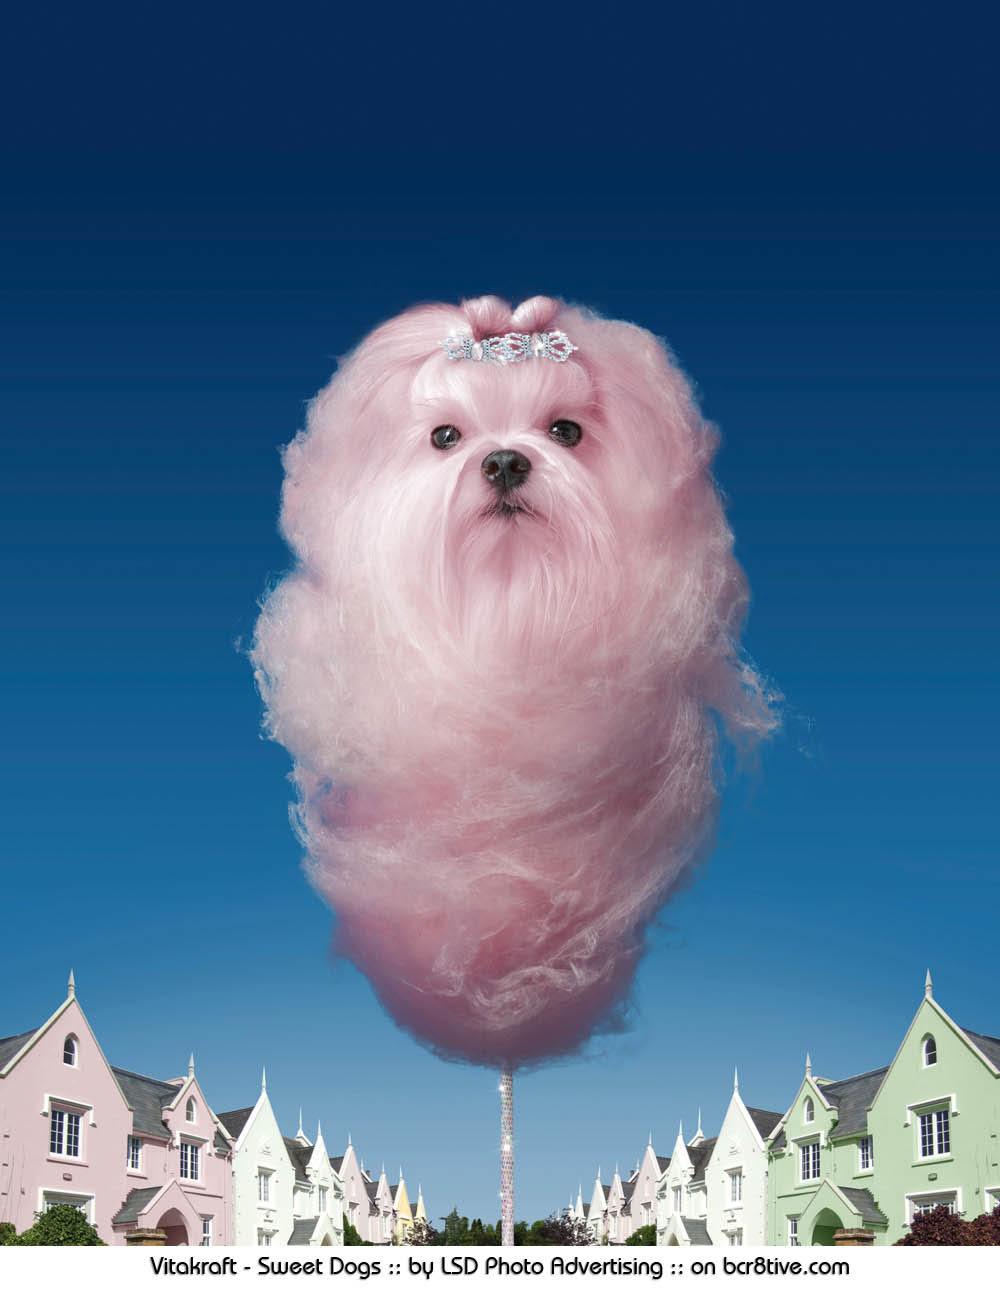 Sweet Dogs :: LSD Photo Advertising Studio :: on bcr8tive.com